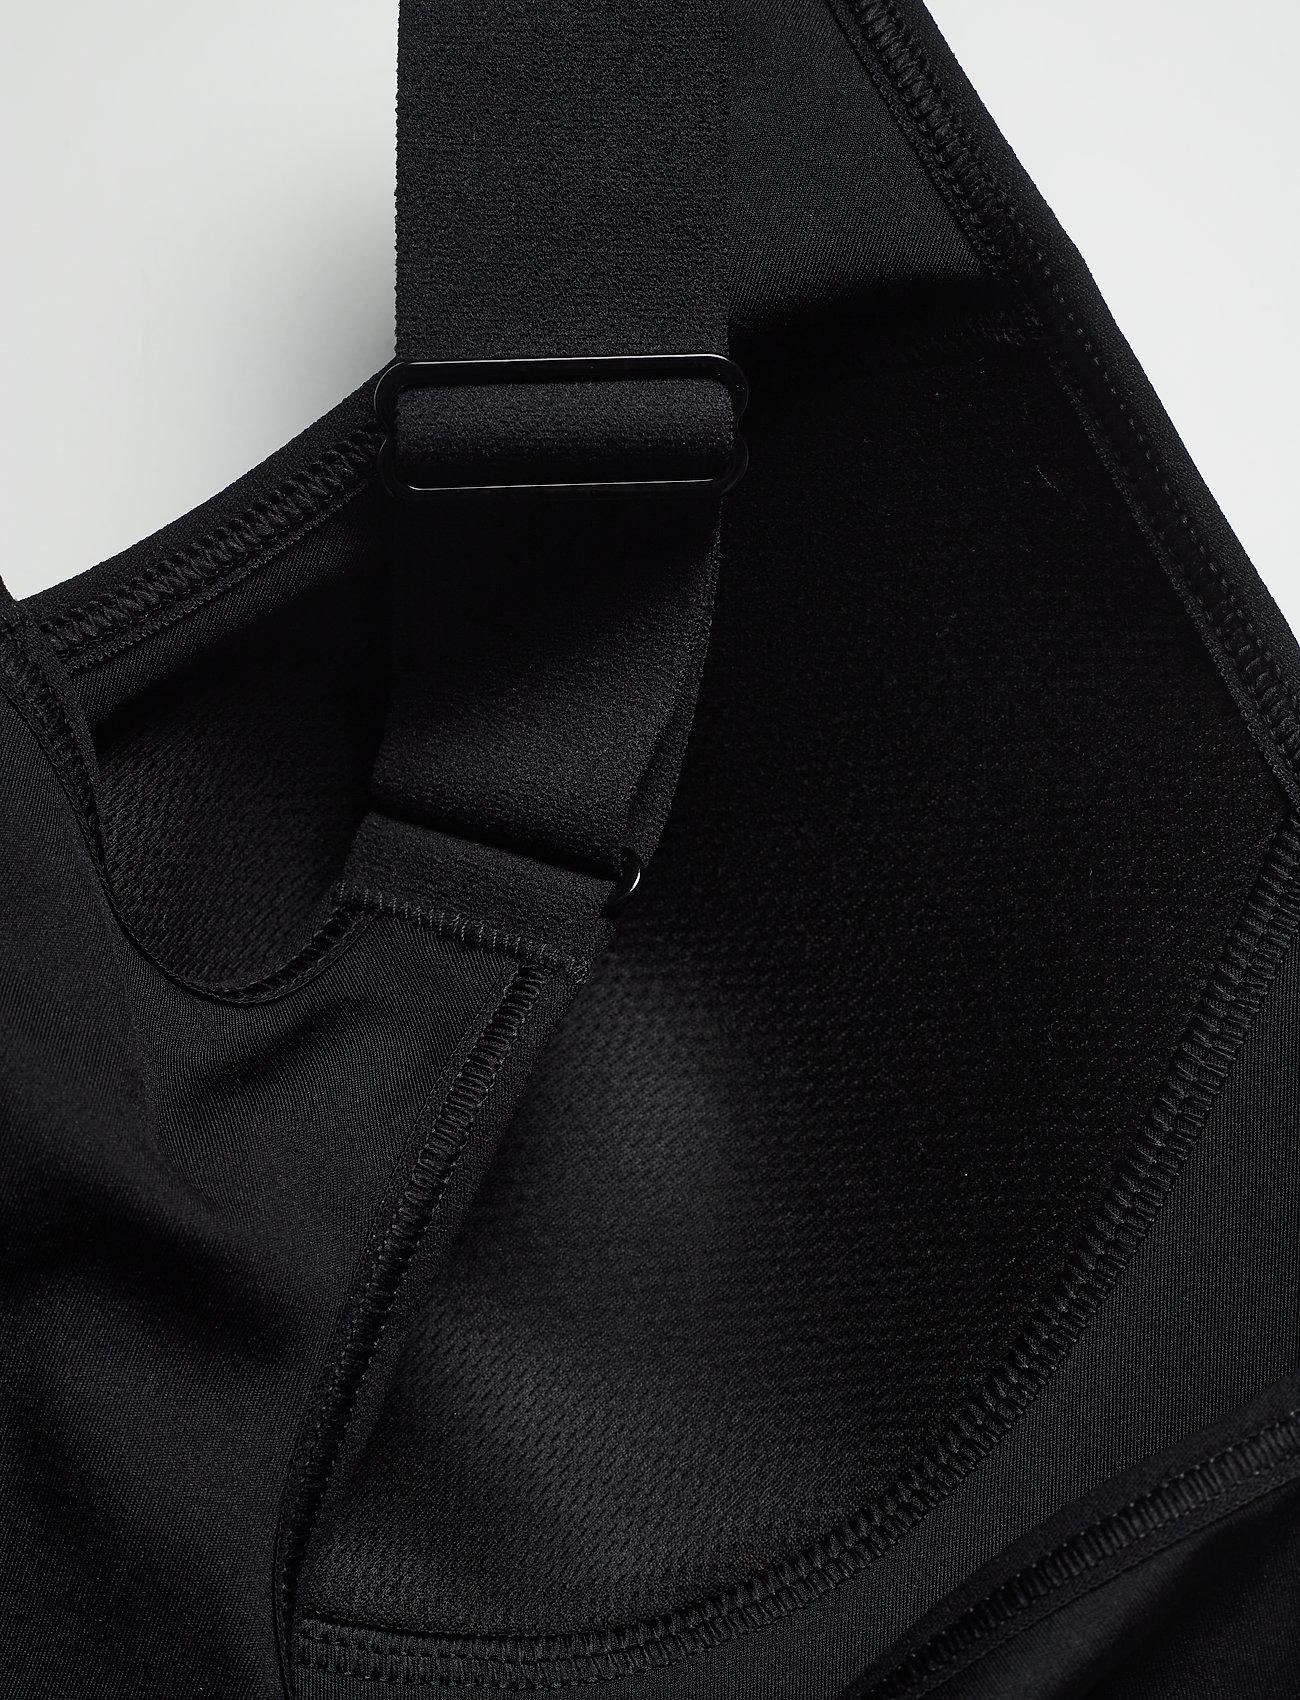 adidas by Stella McCartney - TruePace High Support Bra W - sport bras: high support - black - 3